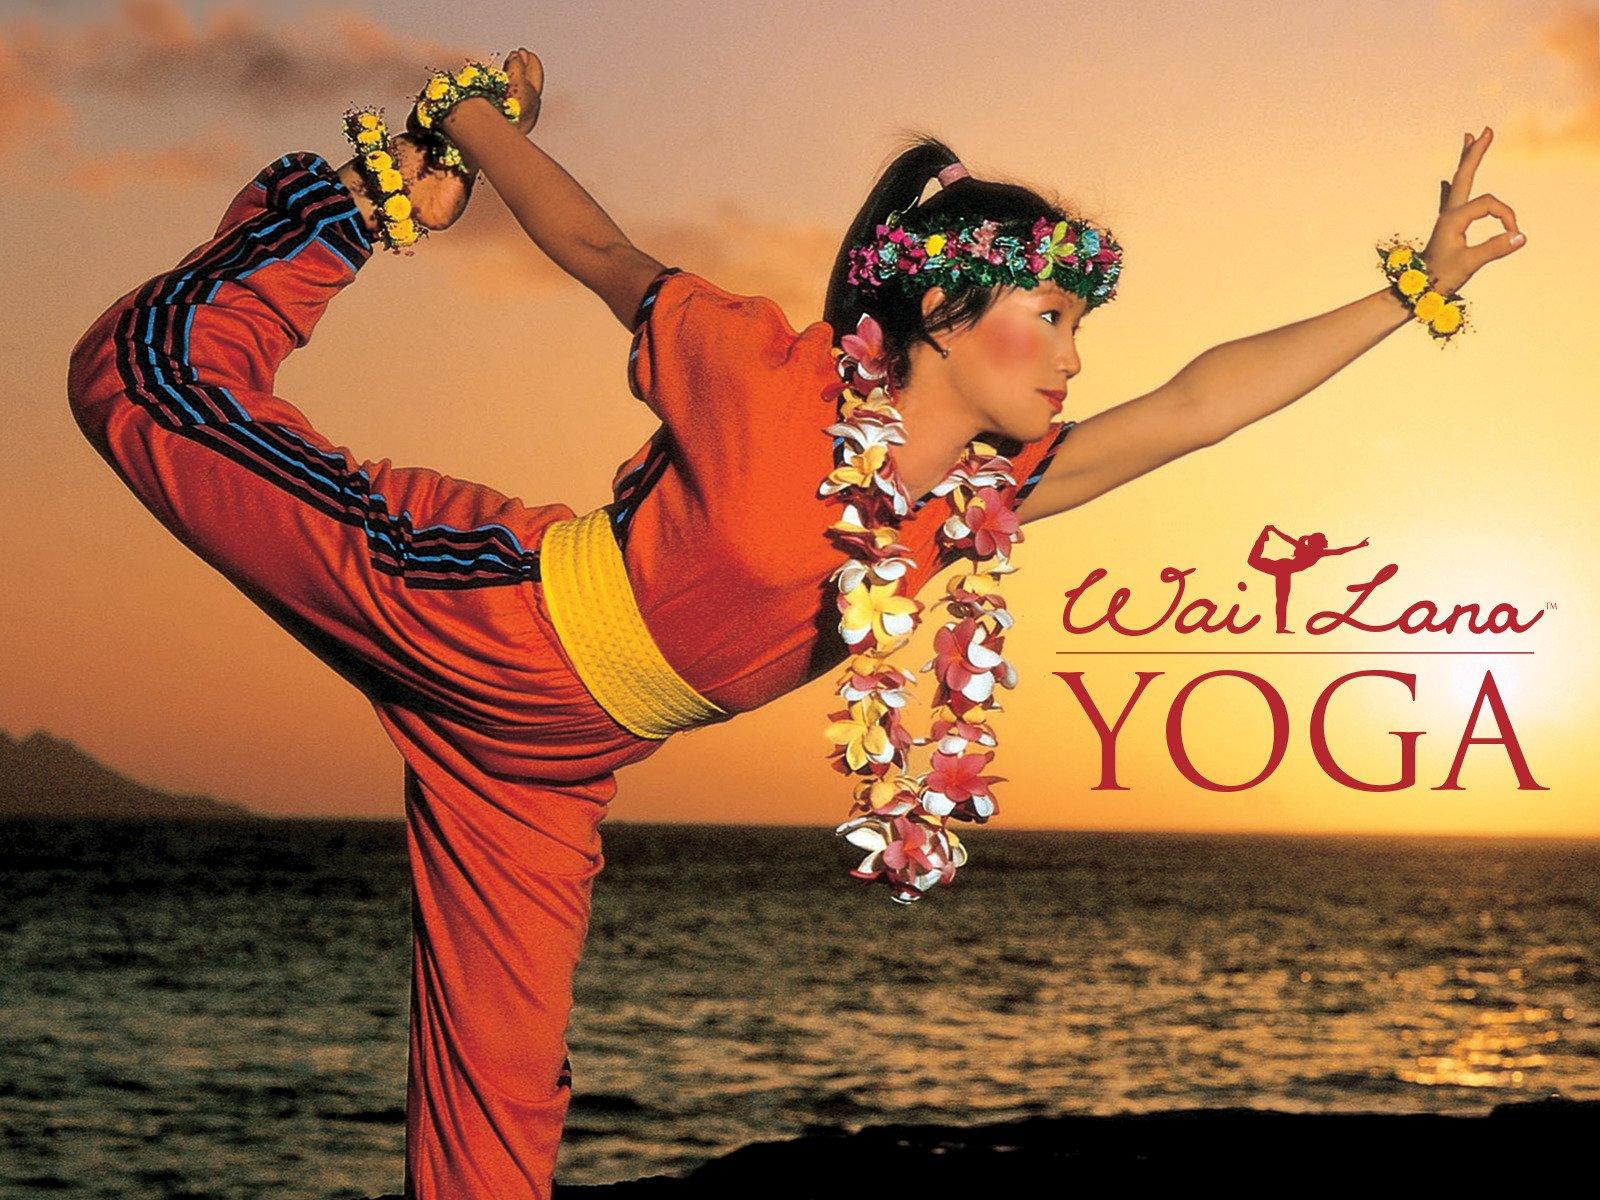 Wai Lana Yoga - Season 3